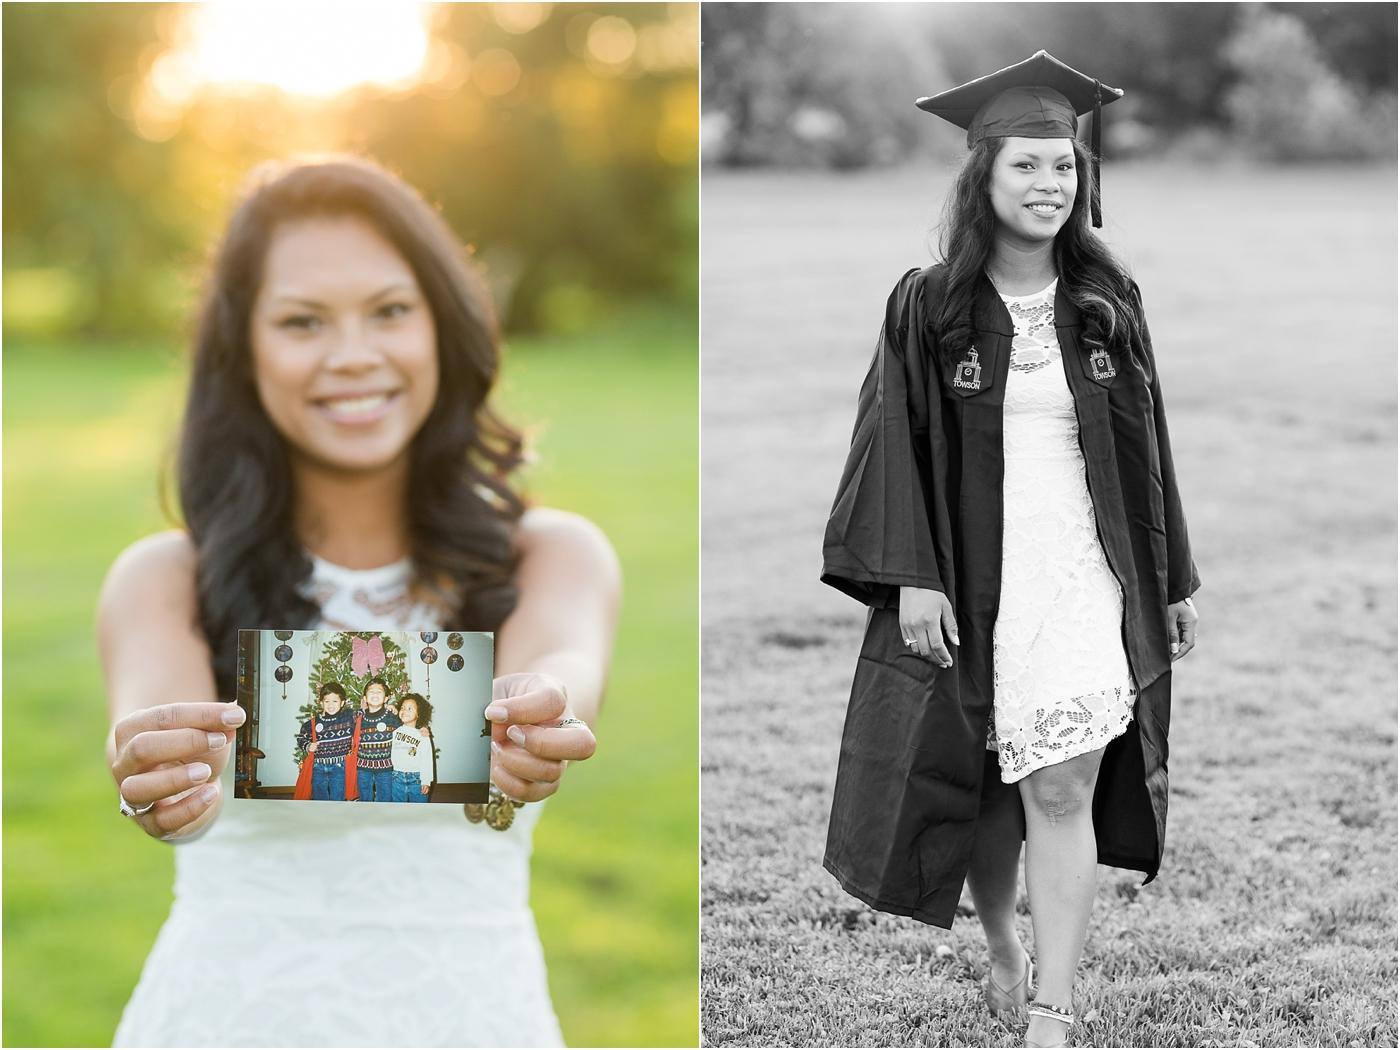 Jenna-Senior-2017-293-graduation-photos.jpg